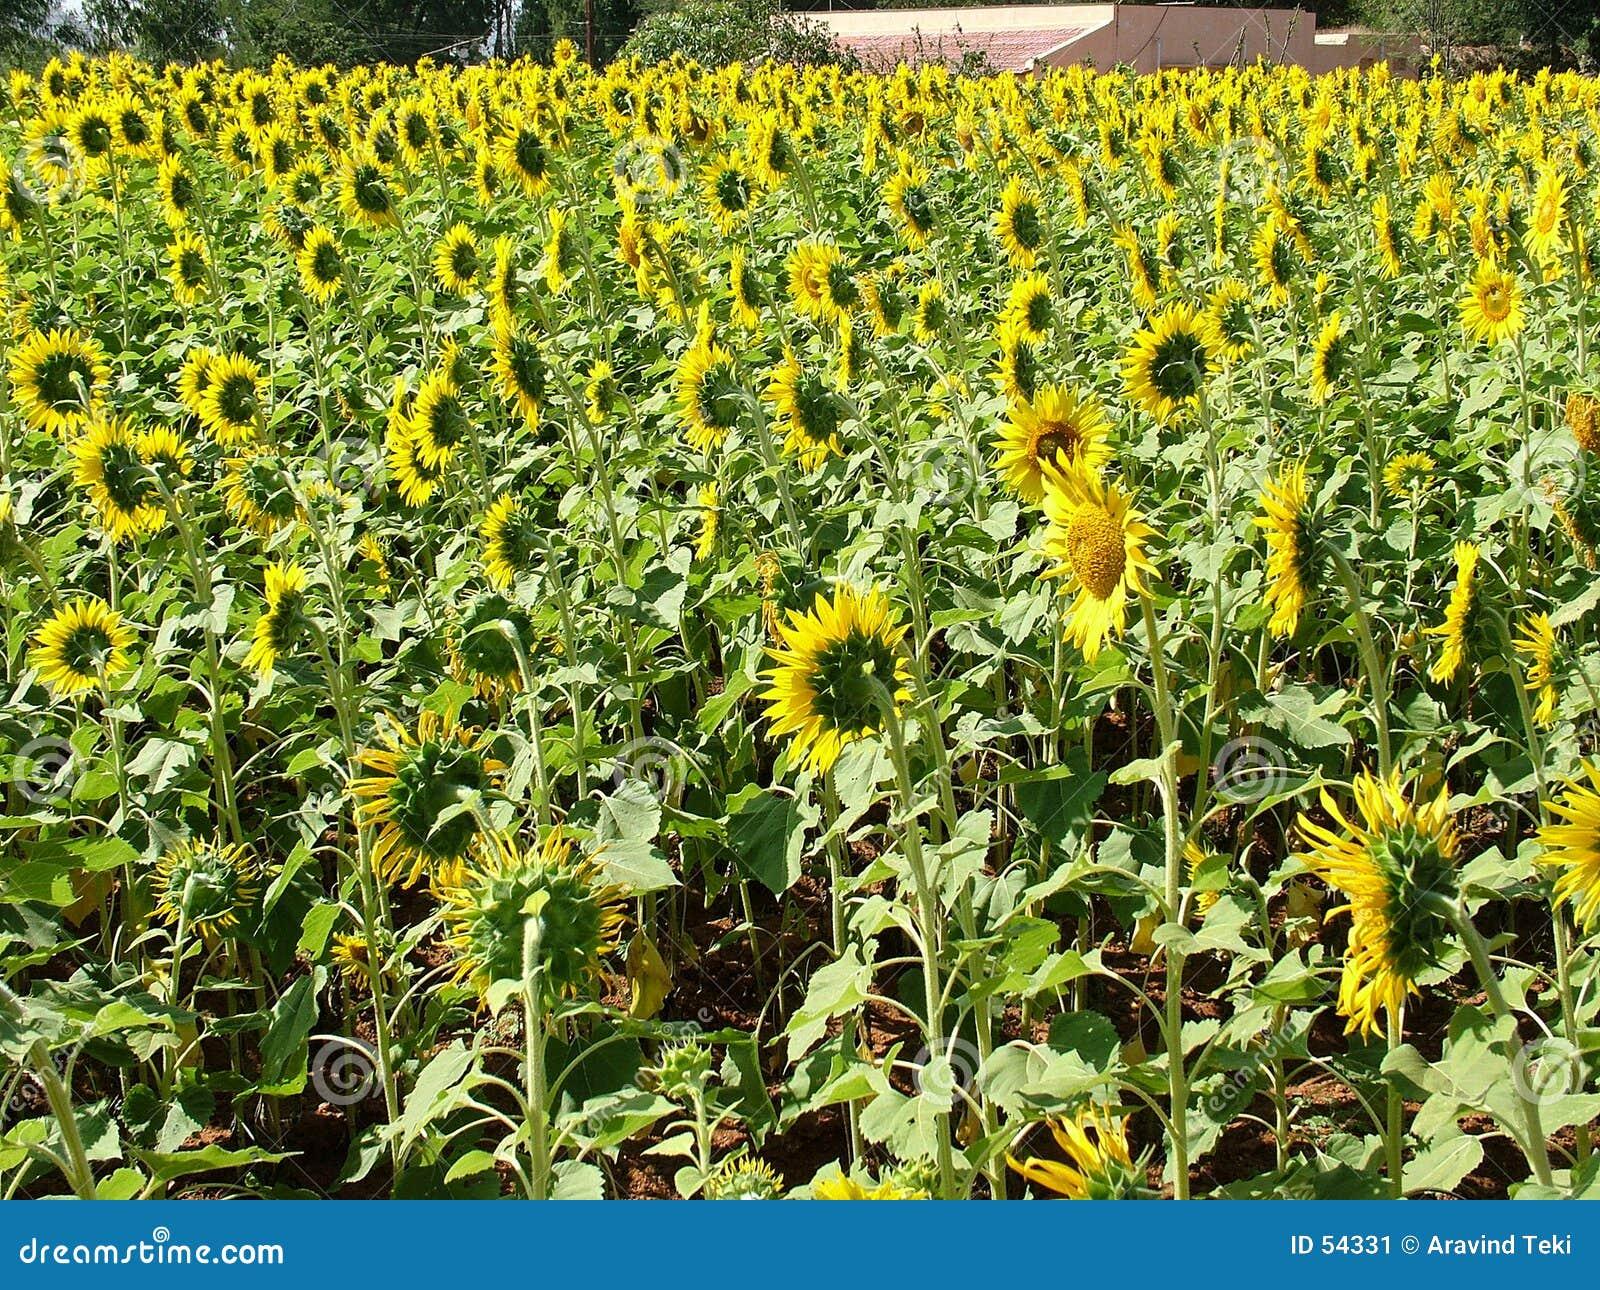 Download ηλίανθοι στοκ εικόνα. εικόνα από πέταλα, συγκομιδή, ήλιος - 54331